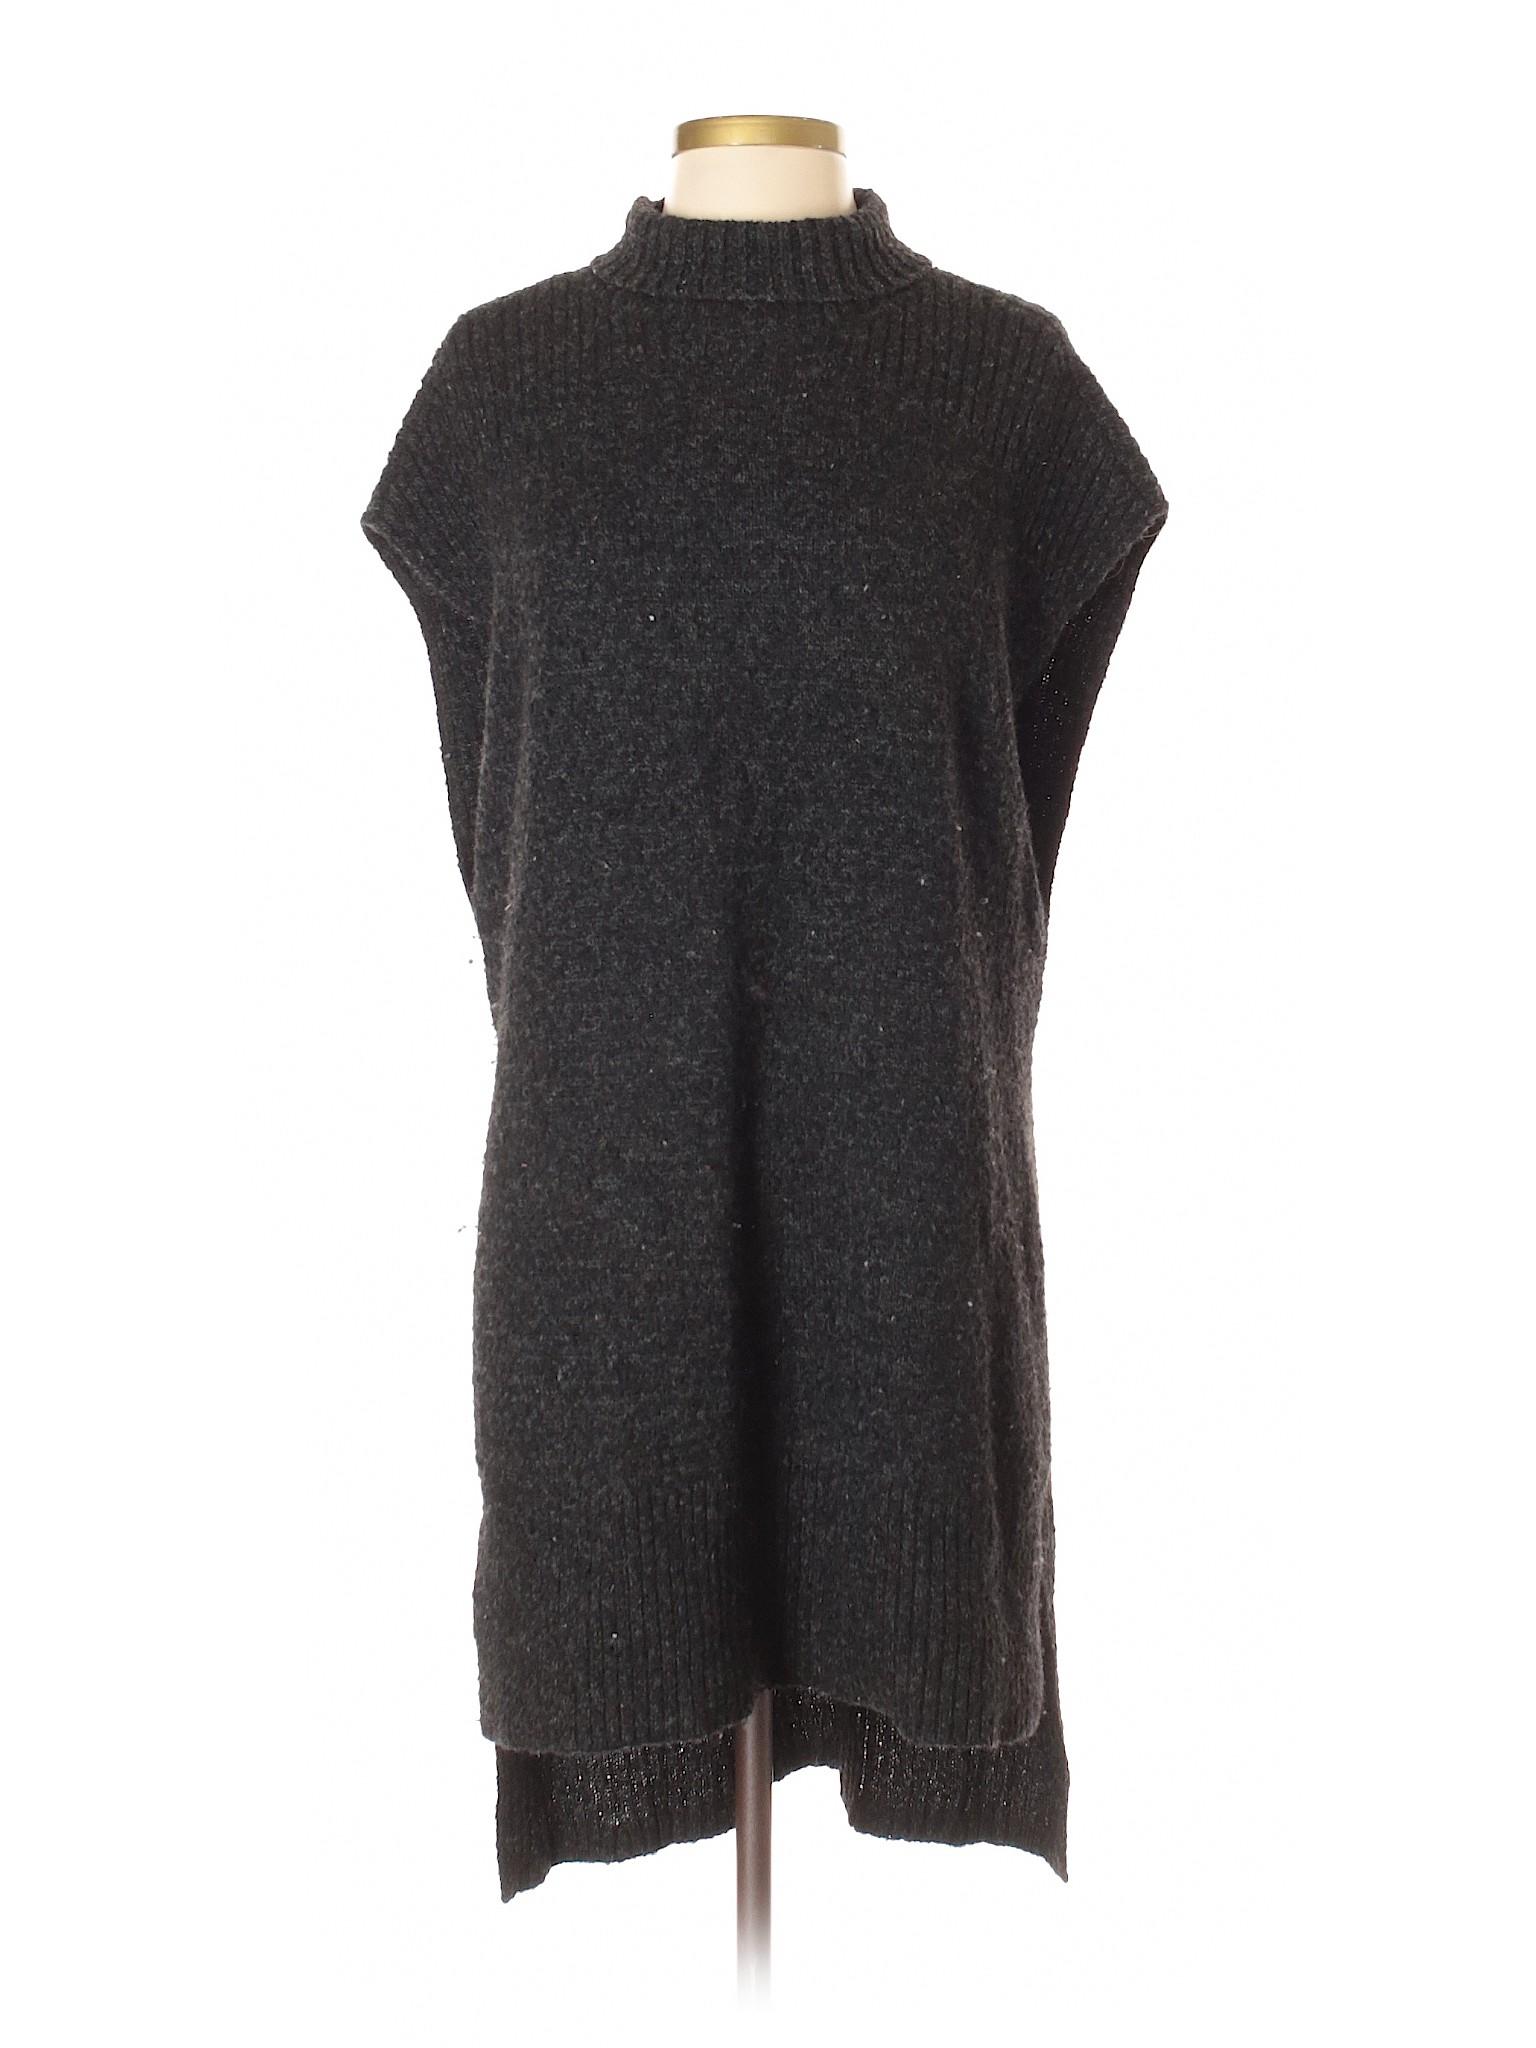 amp; Turtleneck Sweater Boutique Grey Lou 5tXxqgz